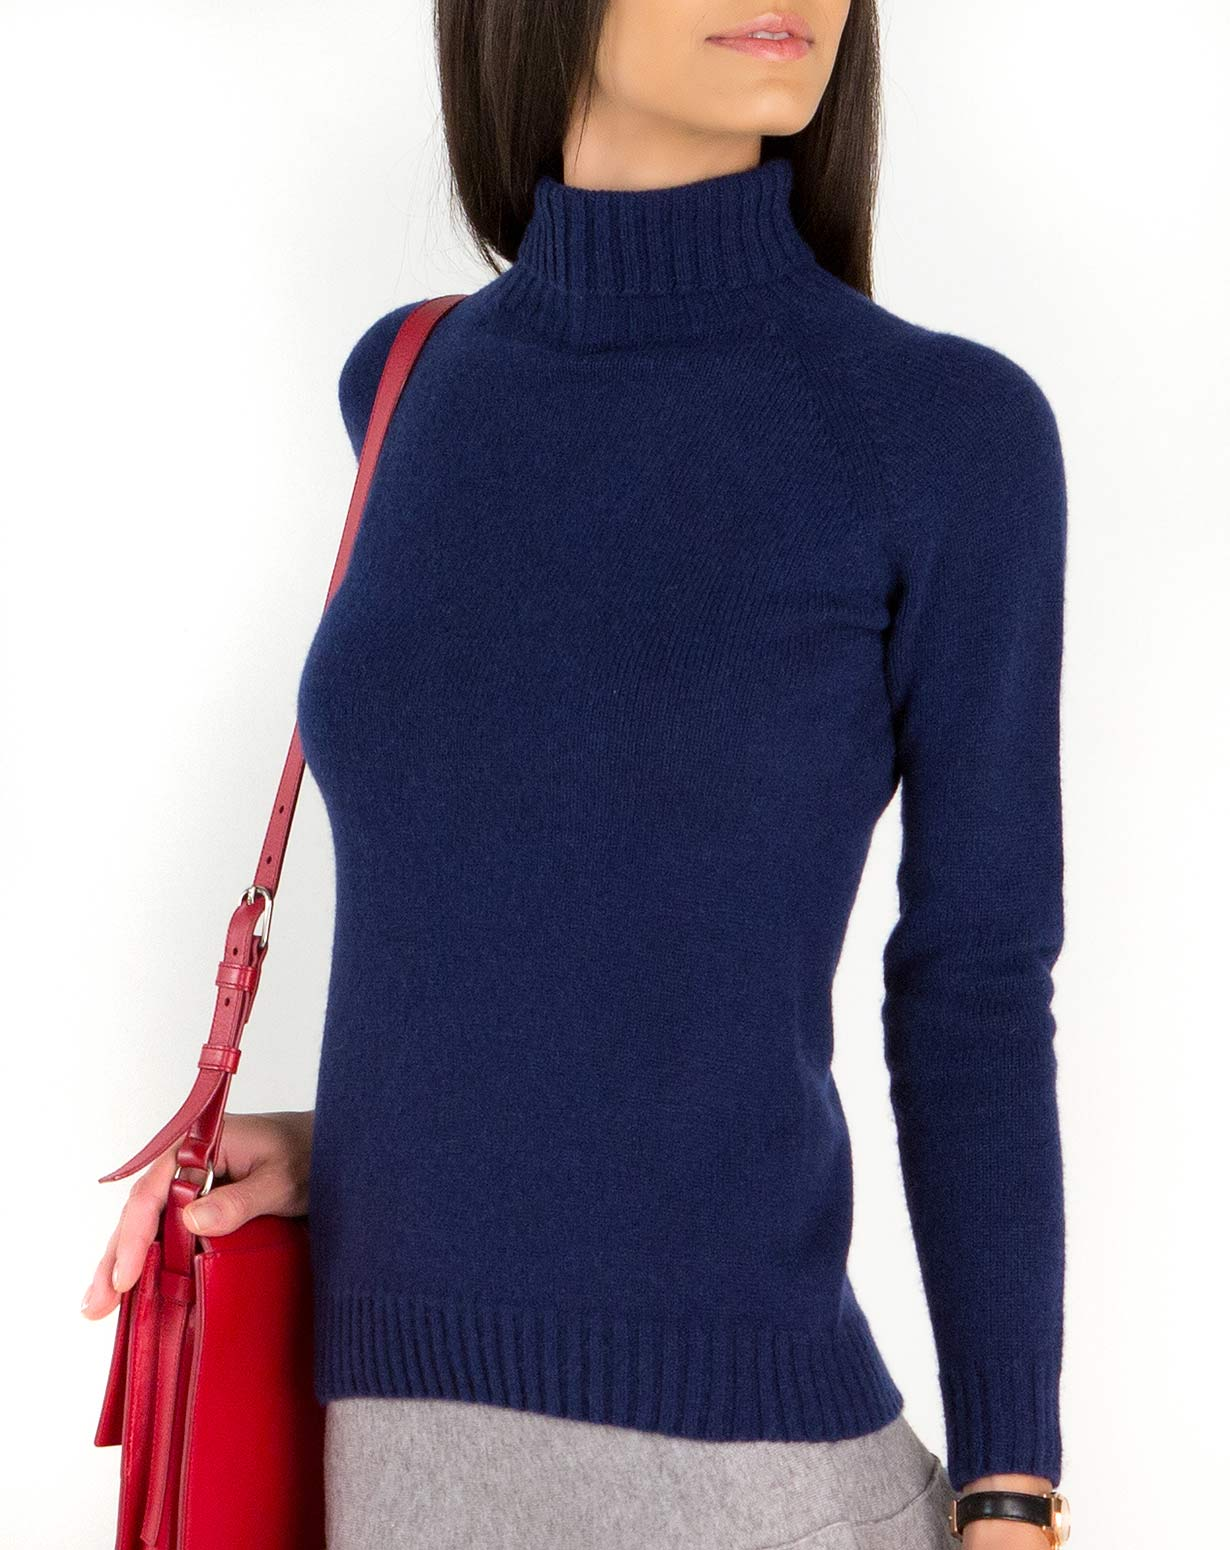 97747a117 Women s Pure Cashmere Turtleneck Sweater